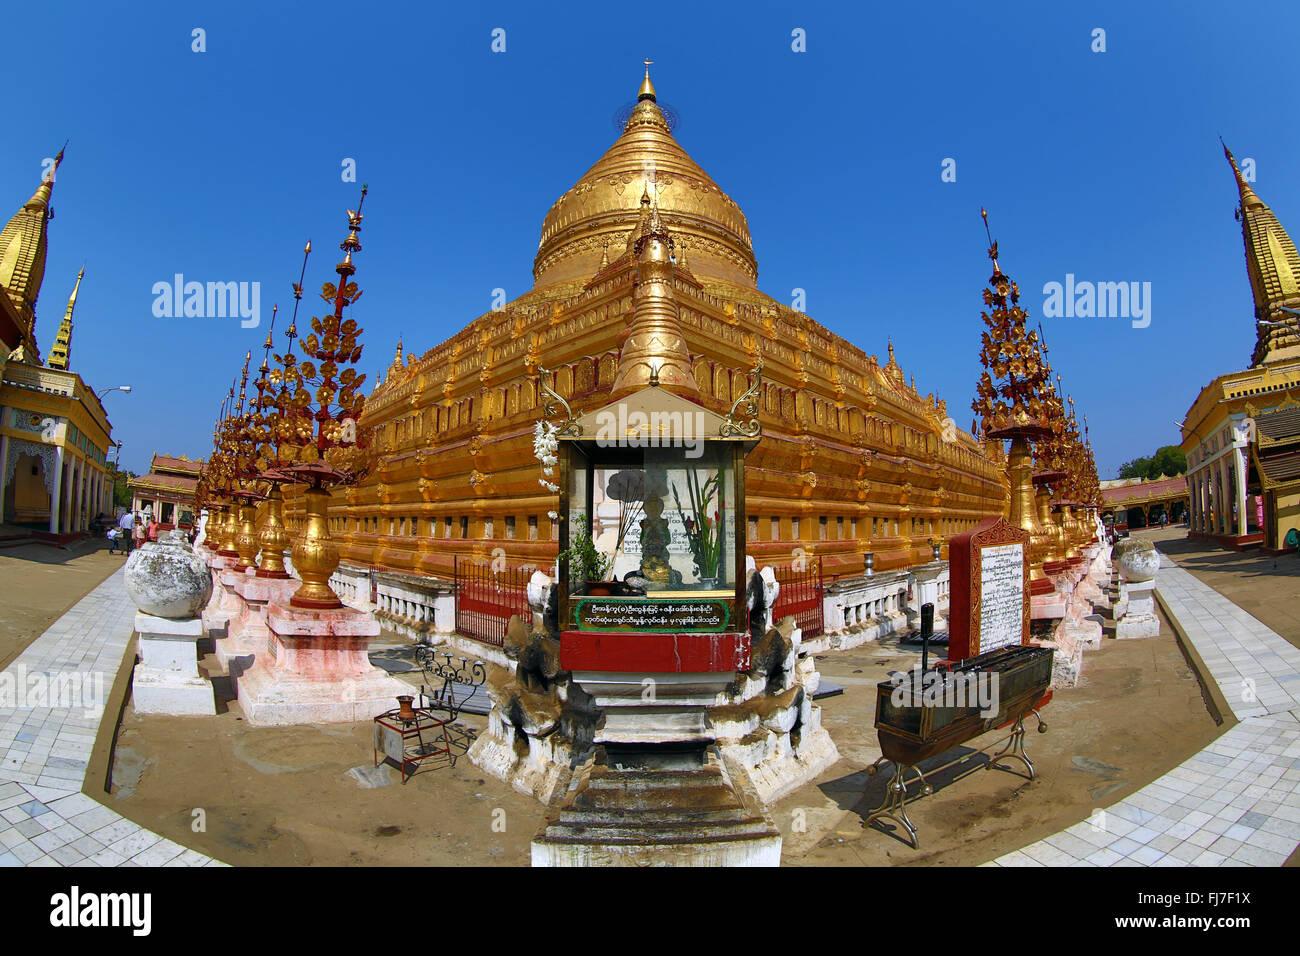 Shwezigon Paya Pagoda in Nuang U, Bagan, Myanmar (Burma) Stock Photo